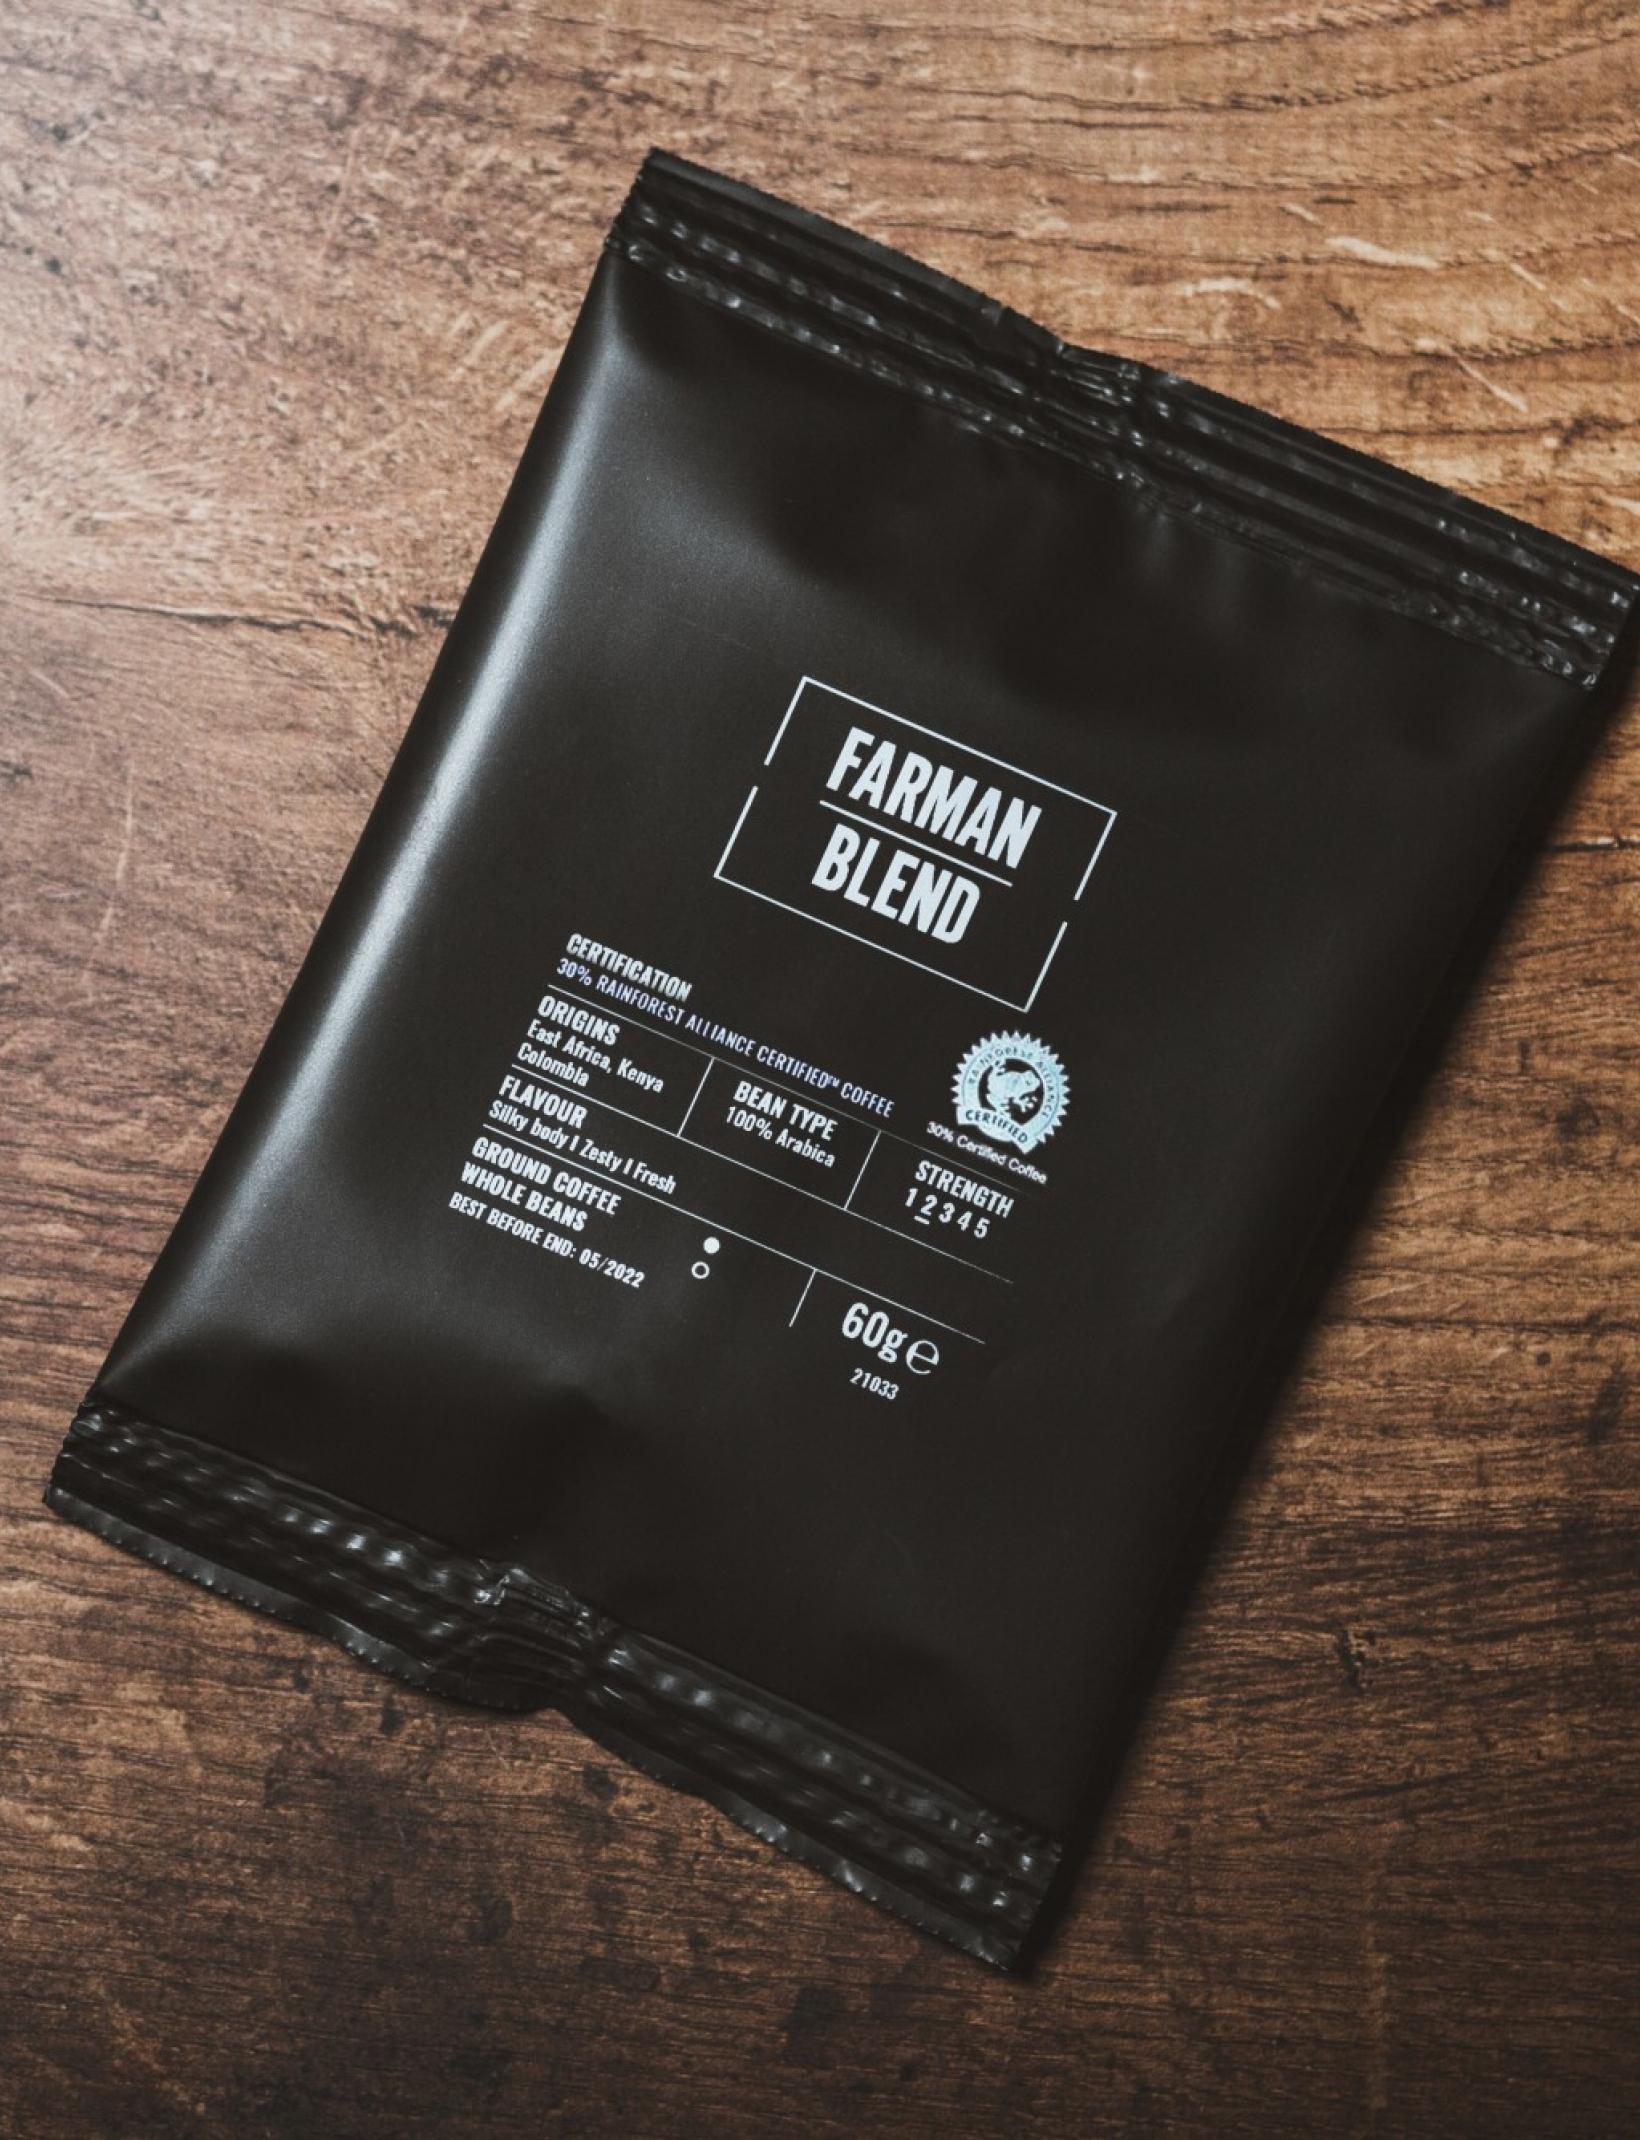 Farman Blend Filter